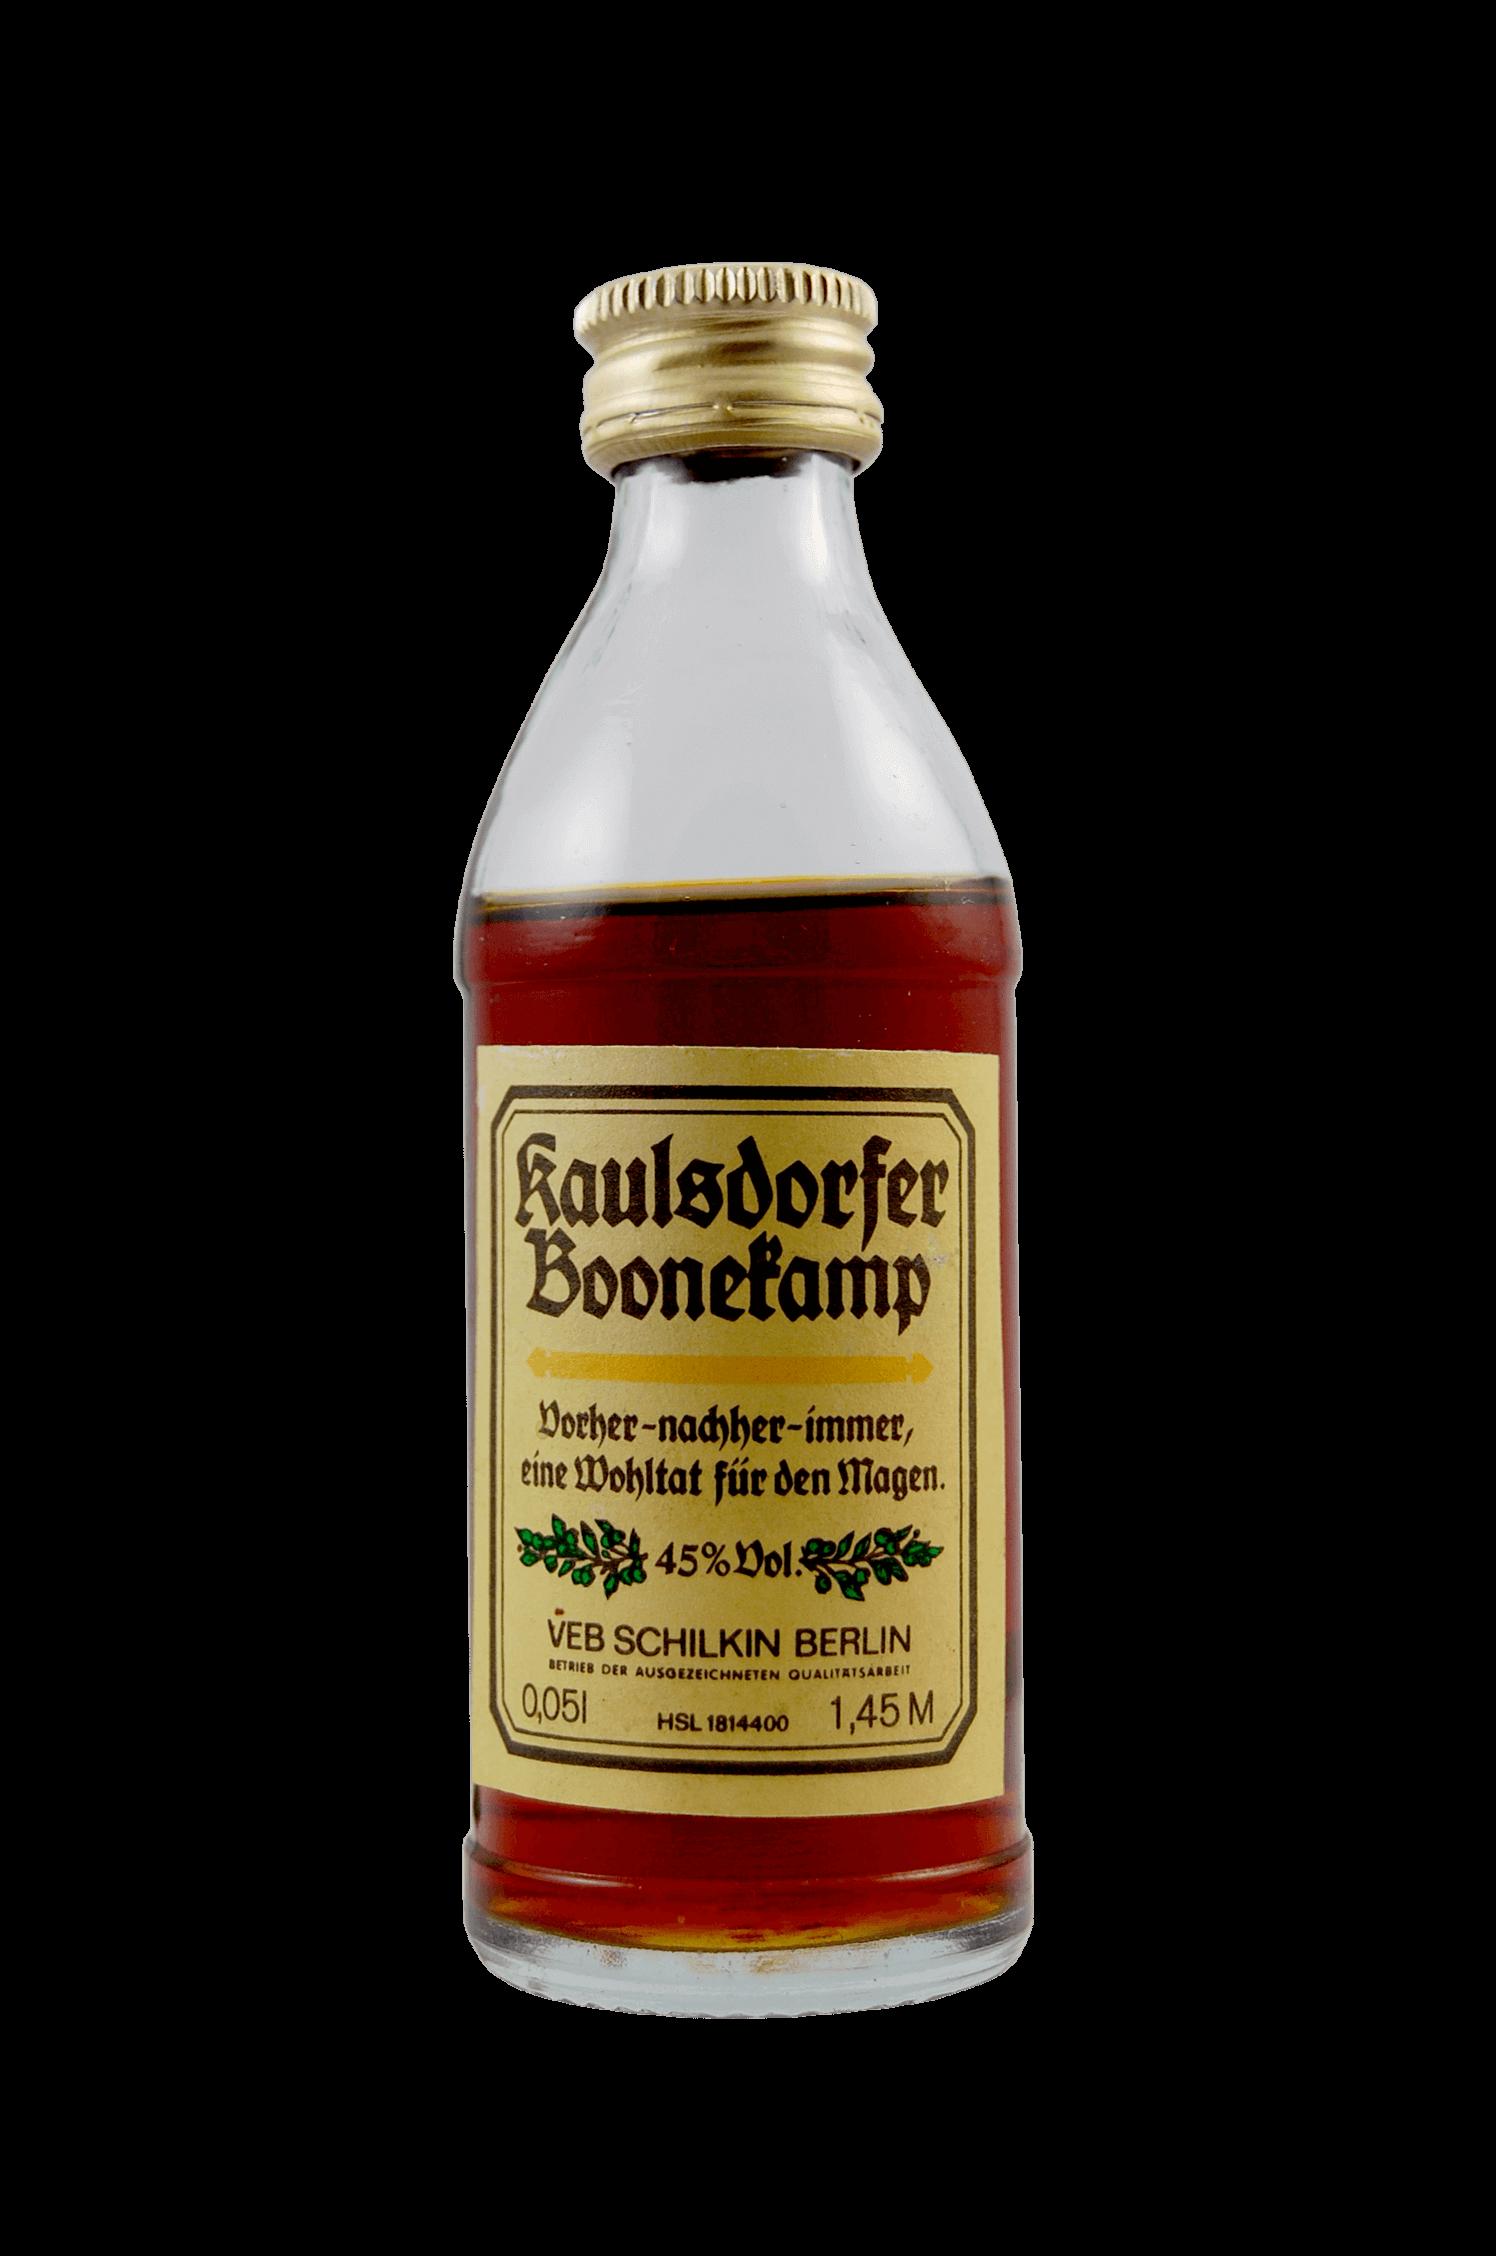 Kaulsdorfer Booneťamp